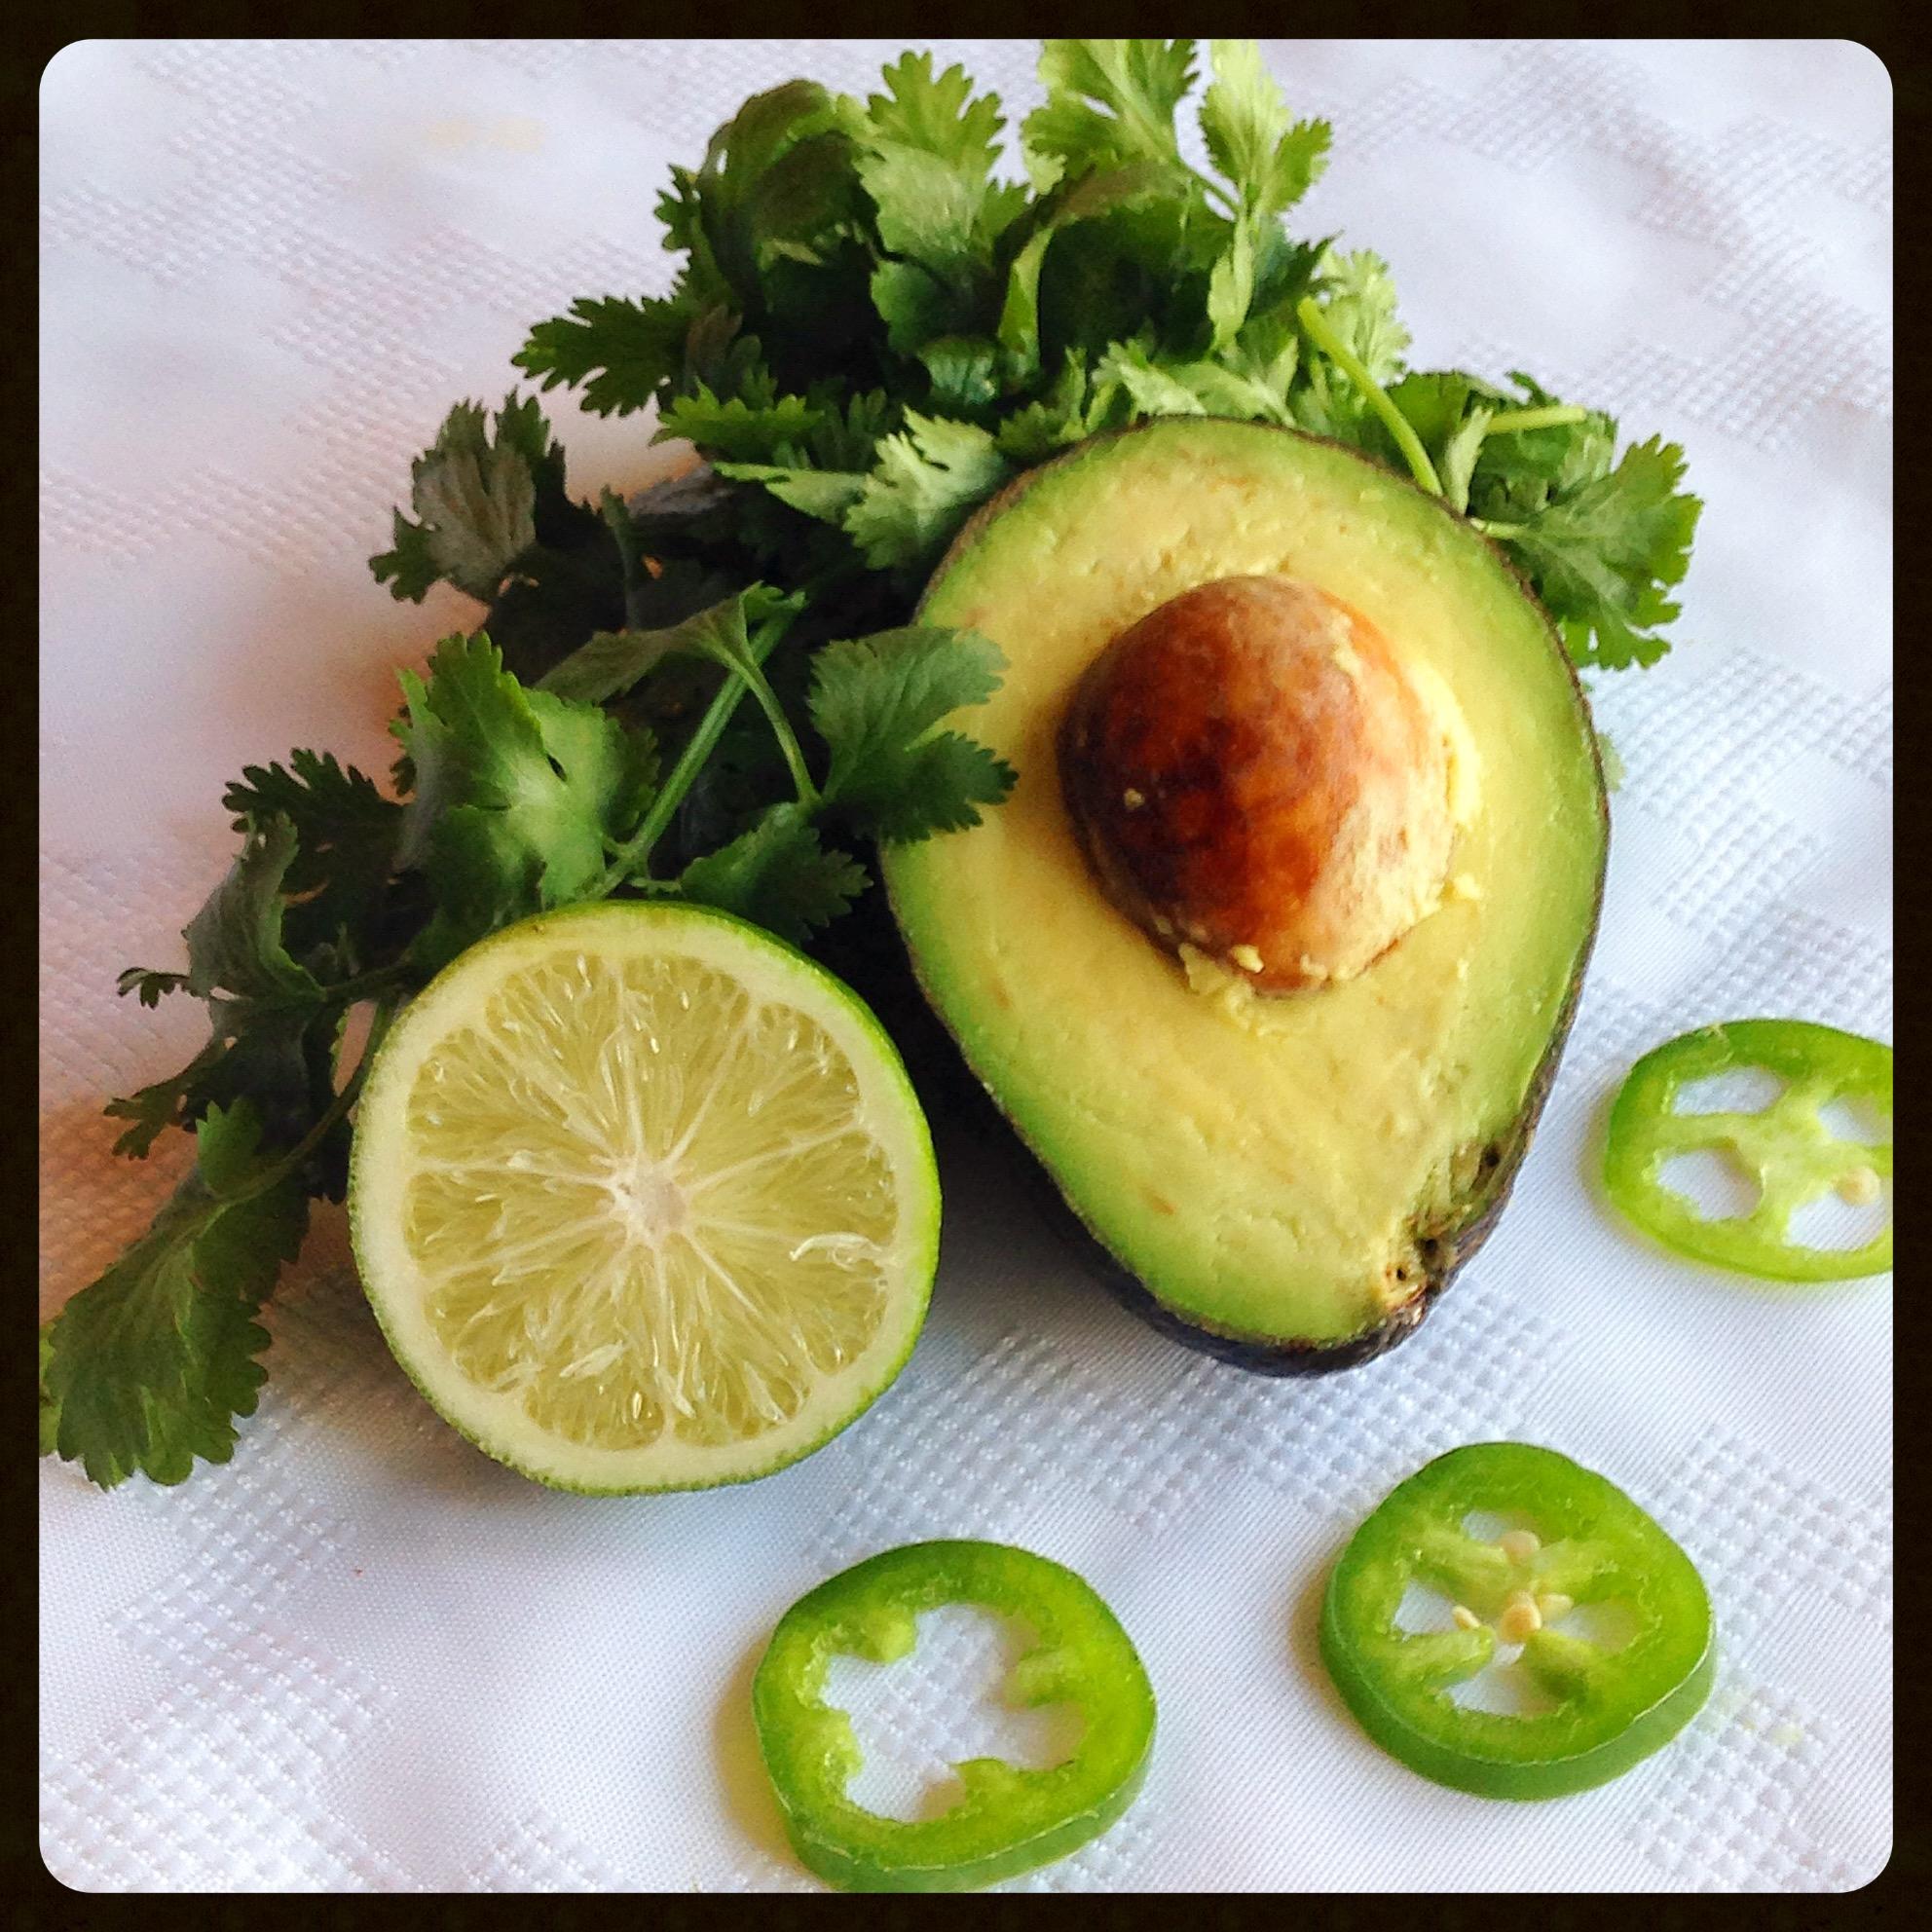 Avocado, lime and cilantro